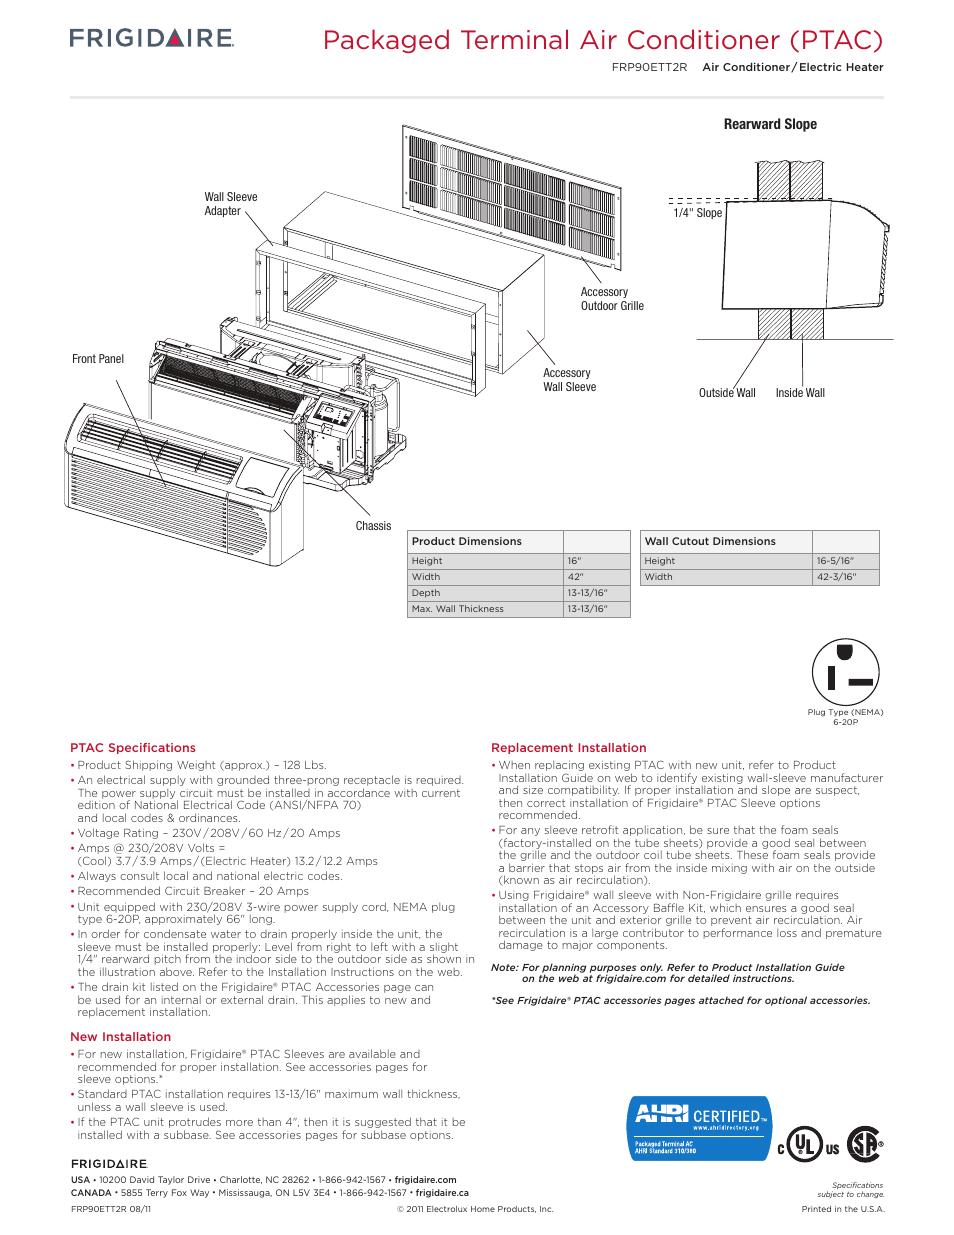 20 amp wiring diagram for ptac wiring diagram libraries 20 amp wiring diagram for ptac wiring librarypackaged terminal air conditioner ptac rearward